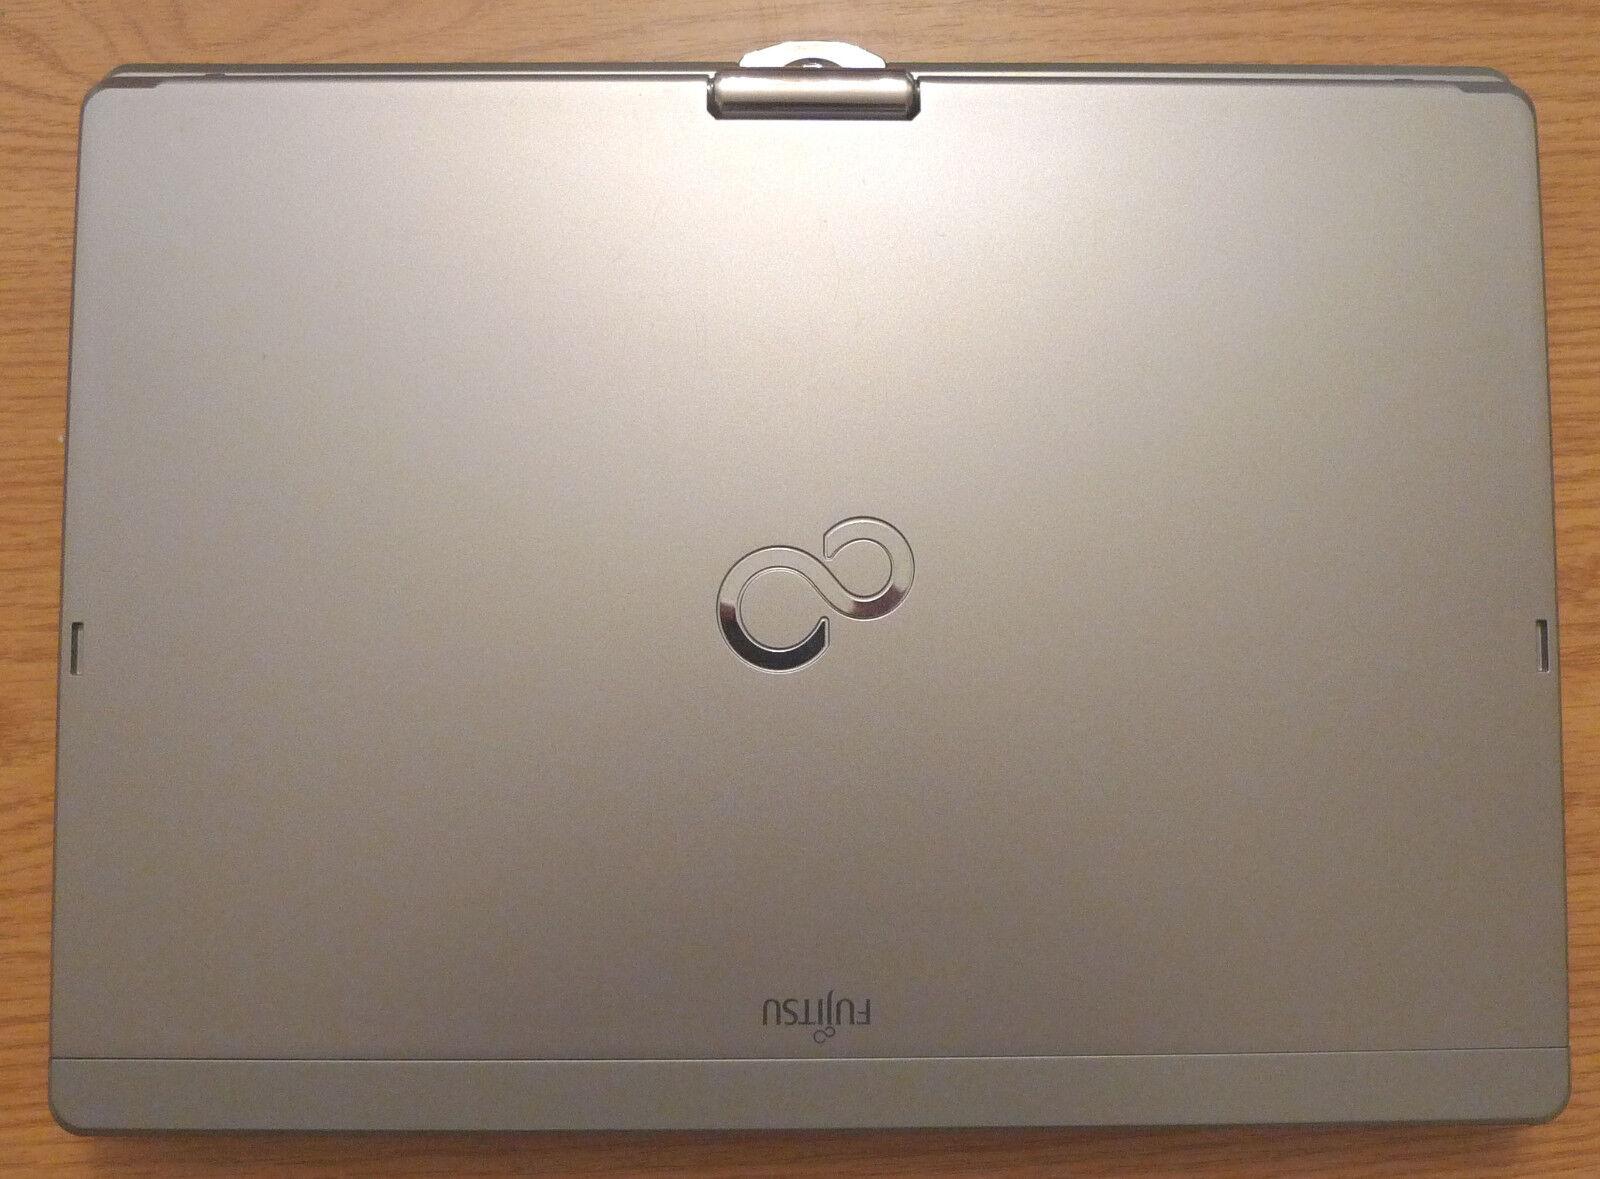 Fujitsu Lifebook T902 i5-3320 256GB SSD Main+Modulr battery WACOM dual-digitizer